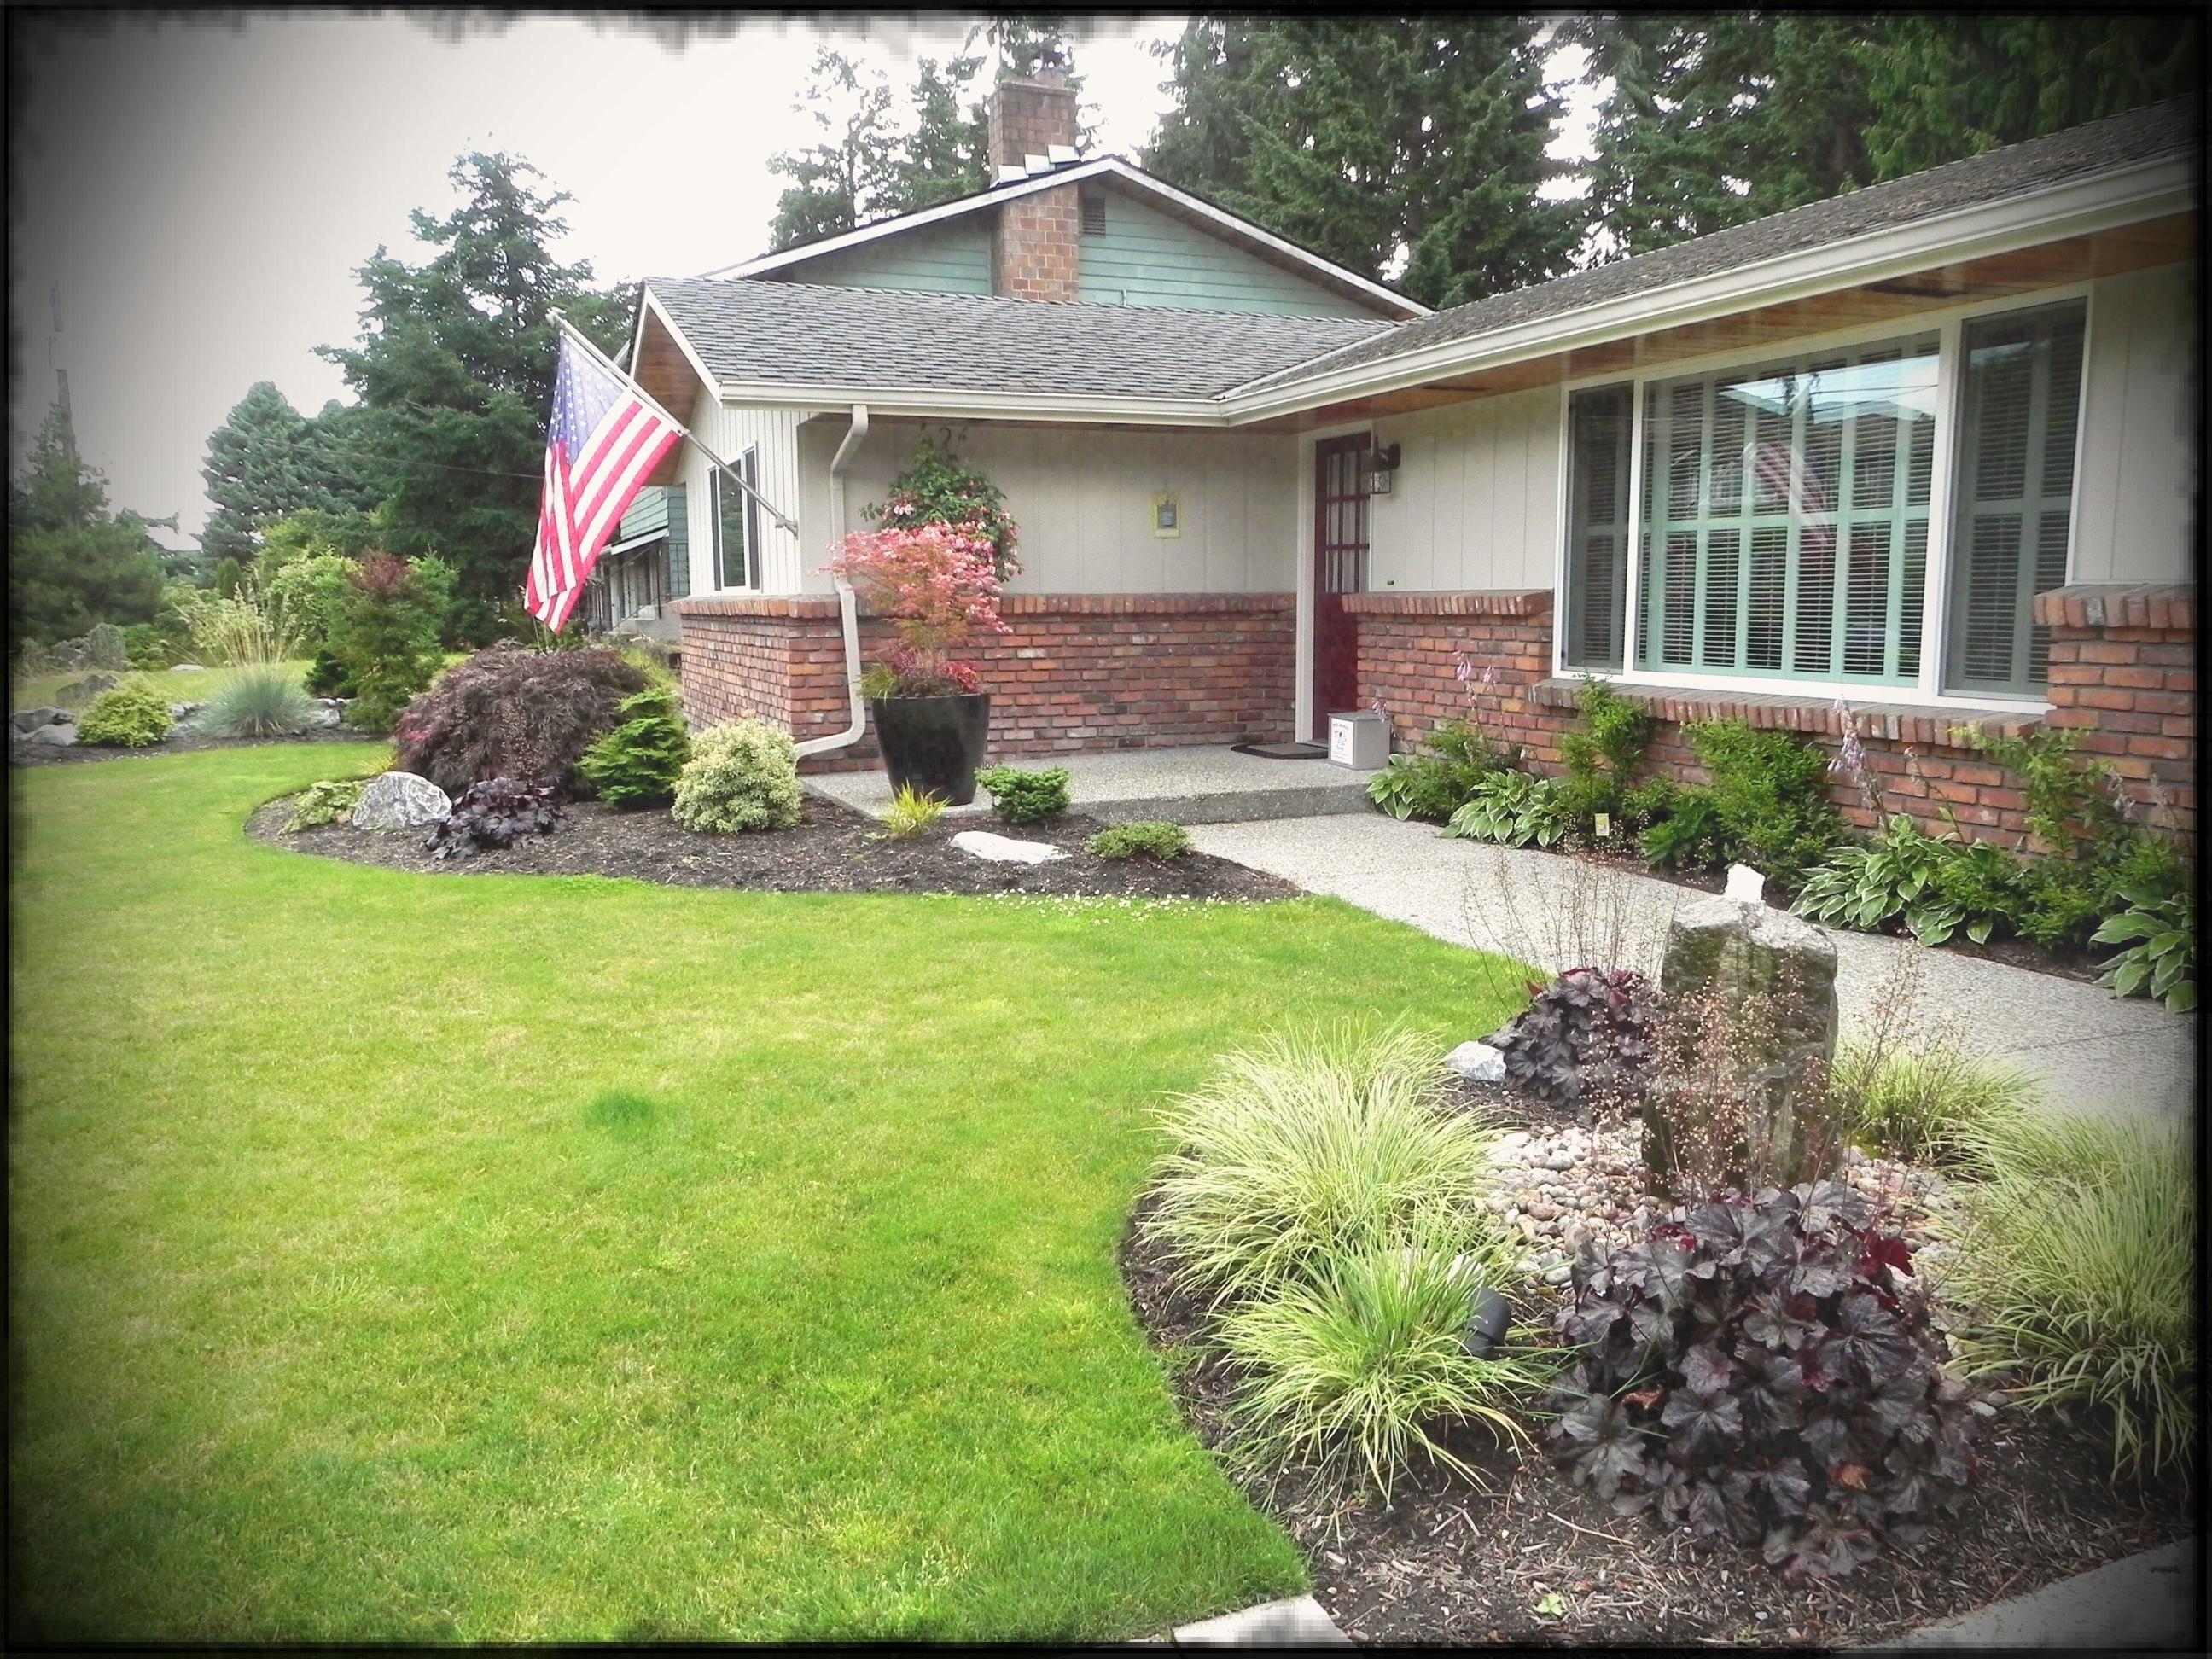 Landscaping Ideas For Brick Ranch Style Homes — Randolph ... on Backyard House Ideas id=57294